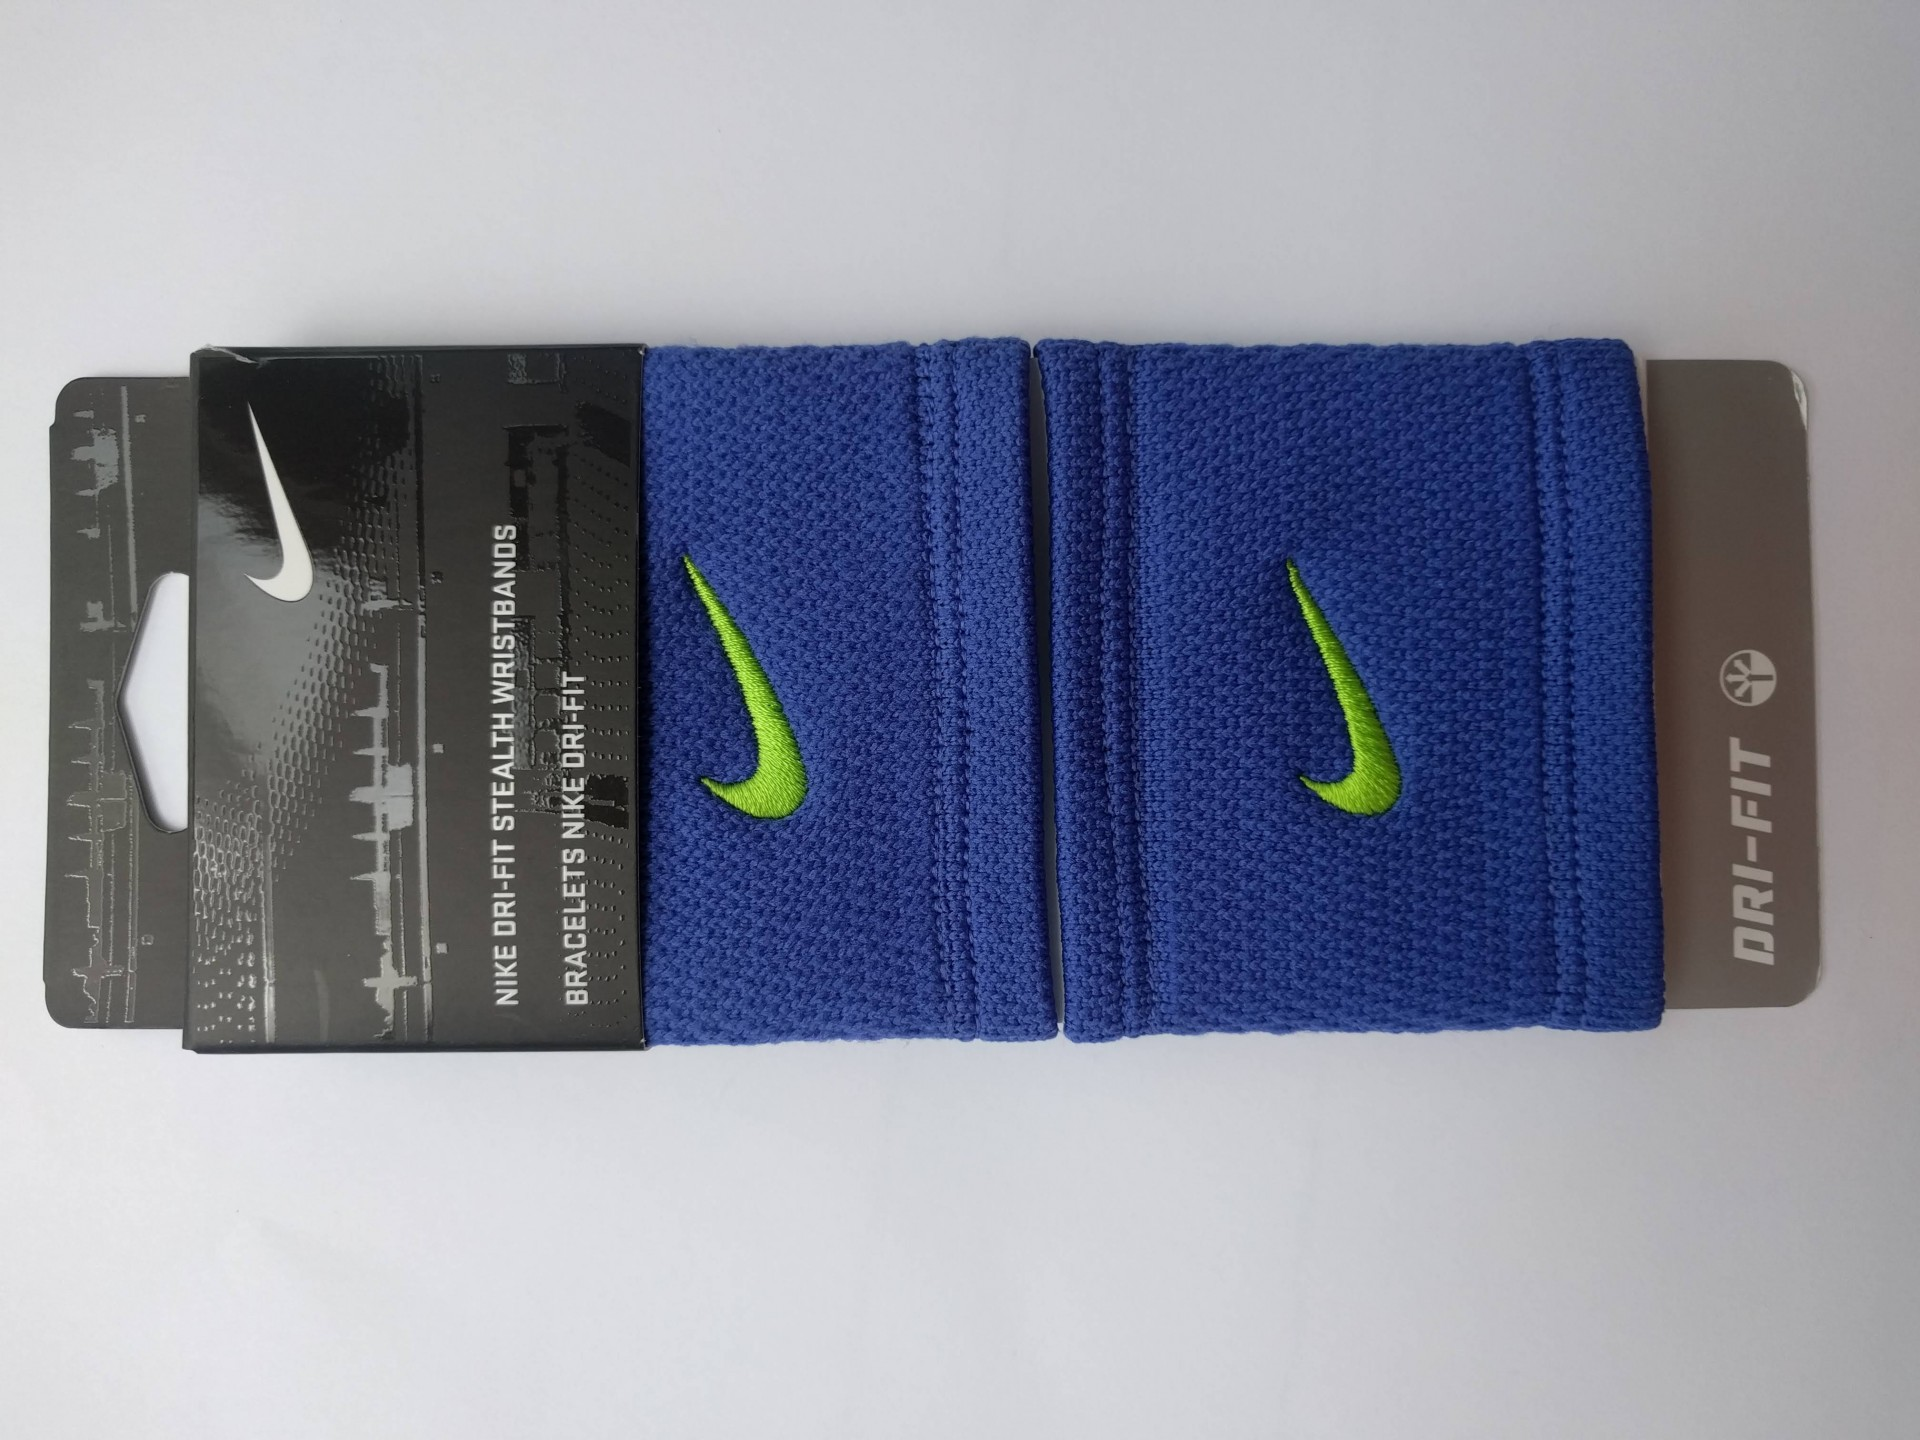 Potítko Nike Dri-Fit Stealth modrá 3c77b611f7